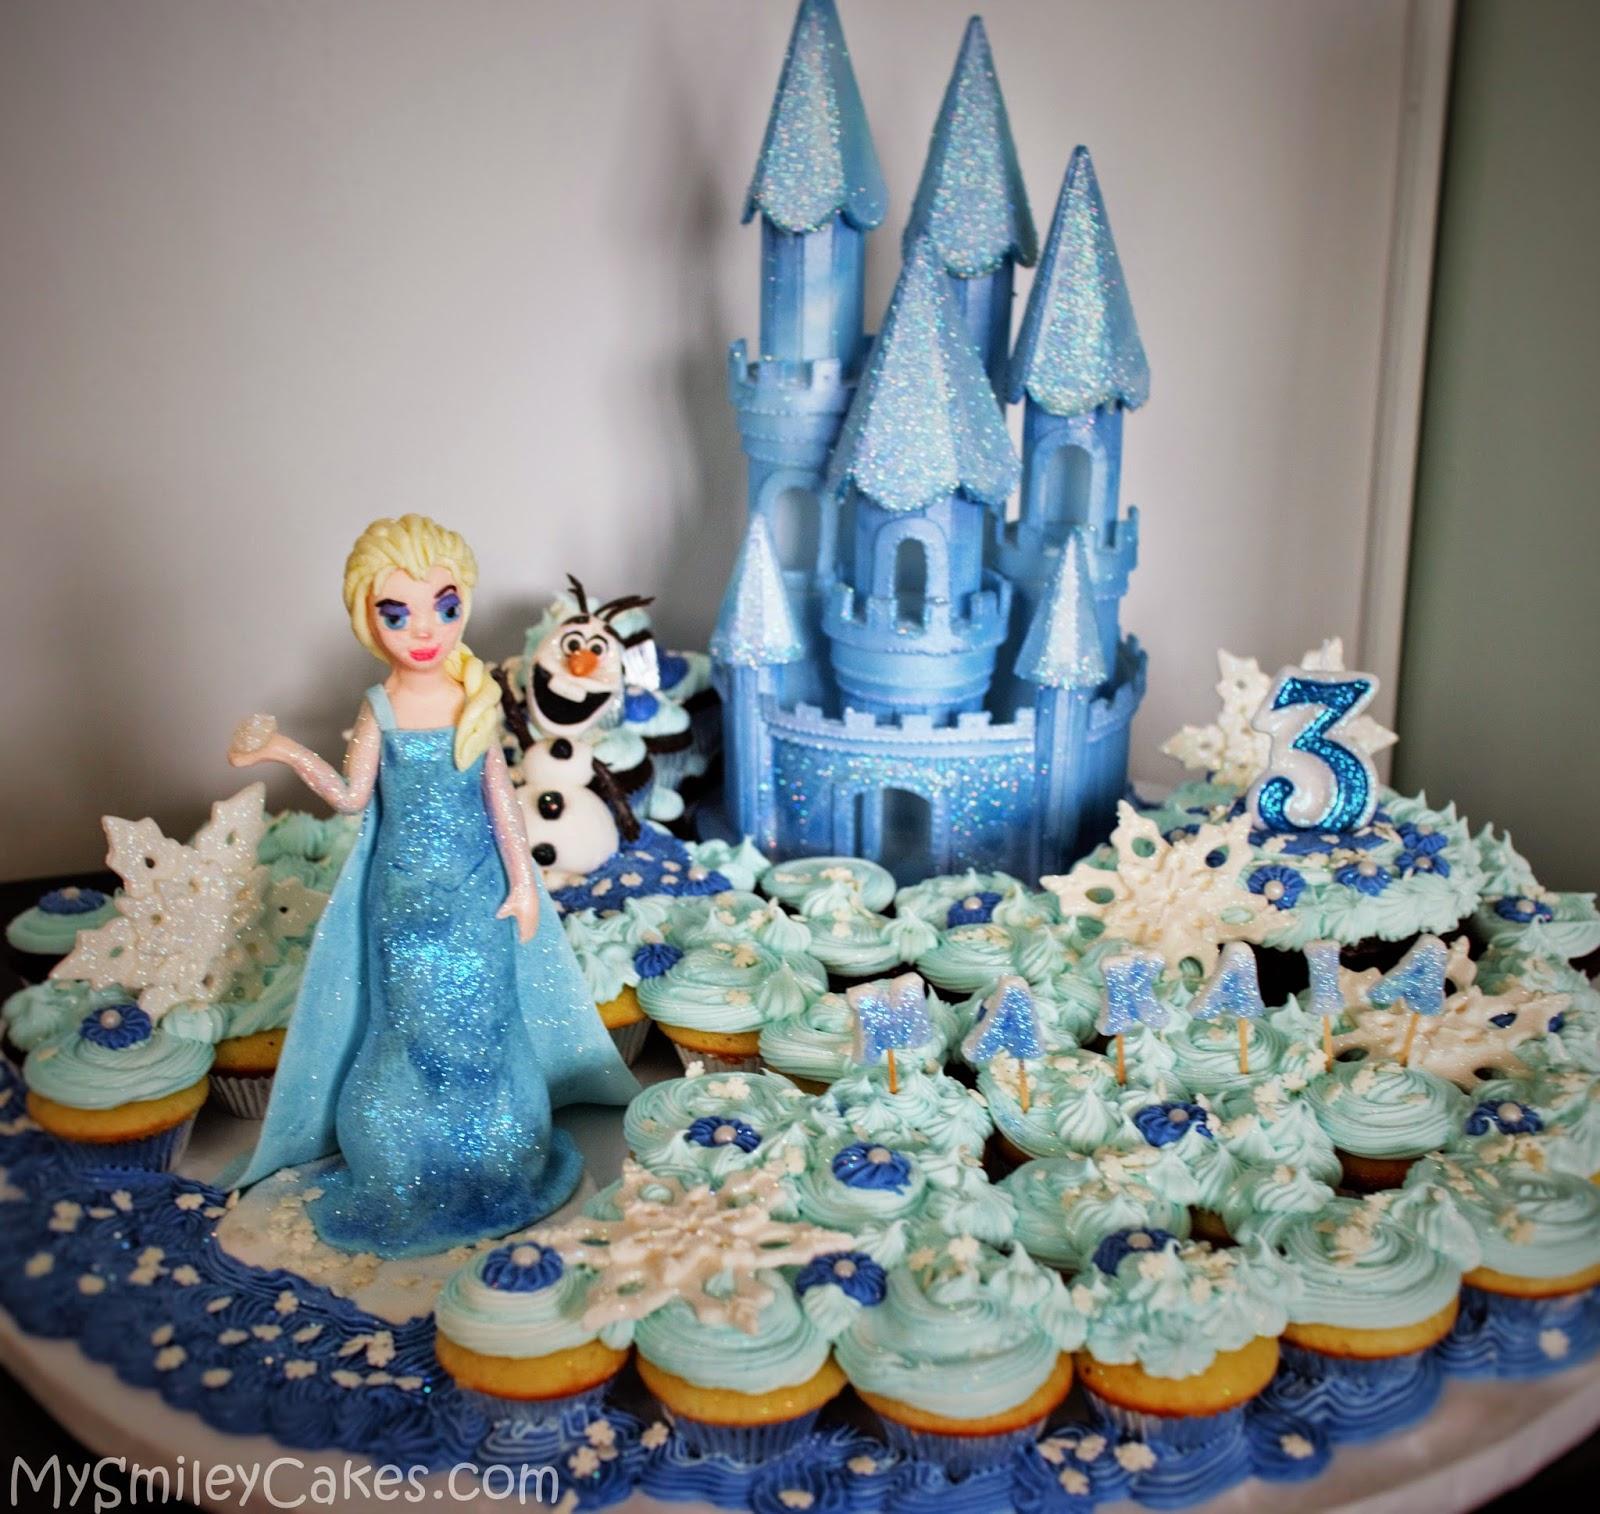 Disney Frozen Themed Cupcake CakeFrozen Cupcake Cake